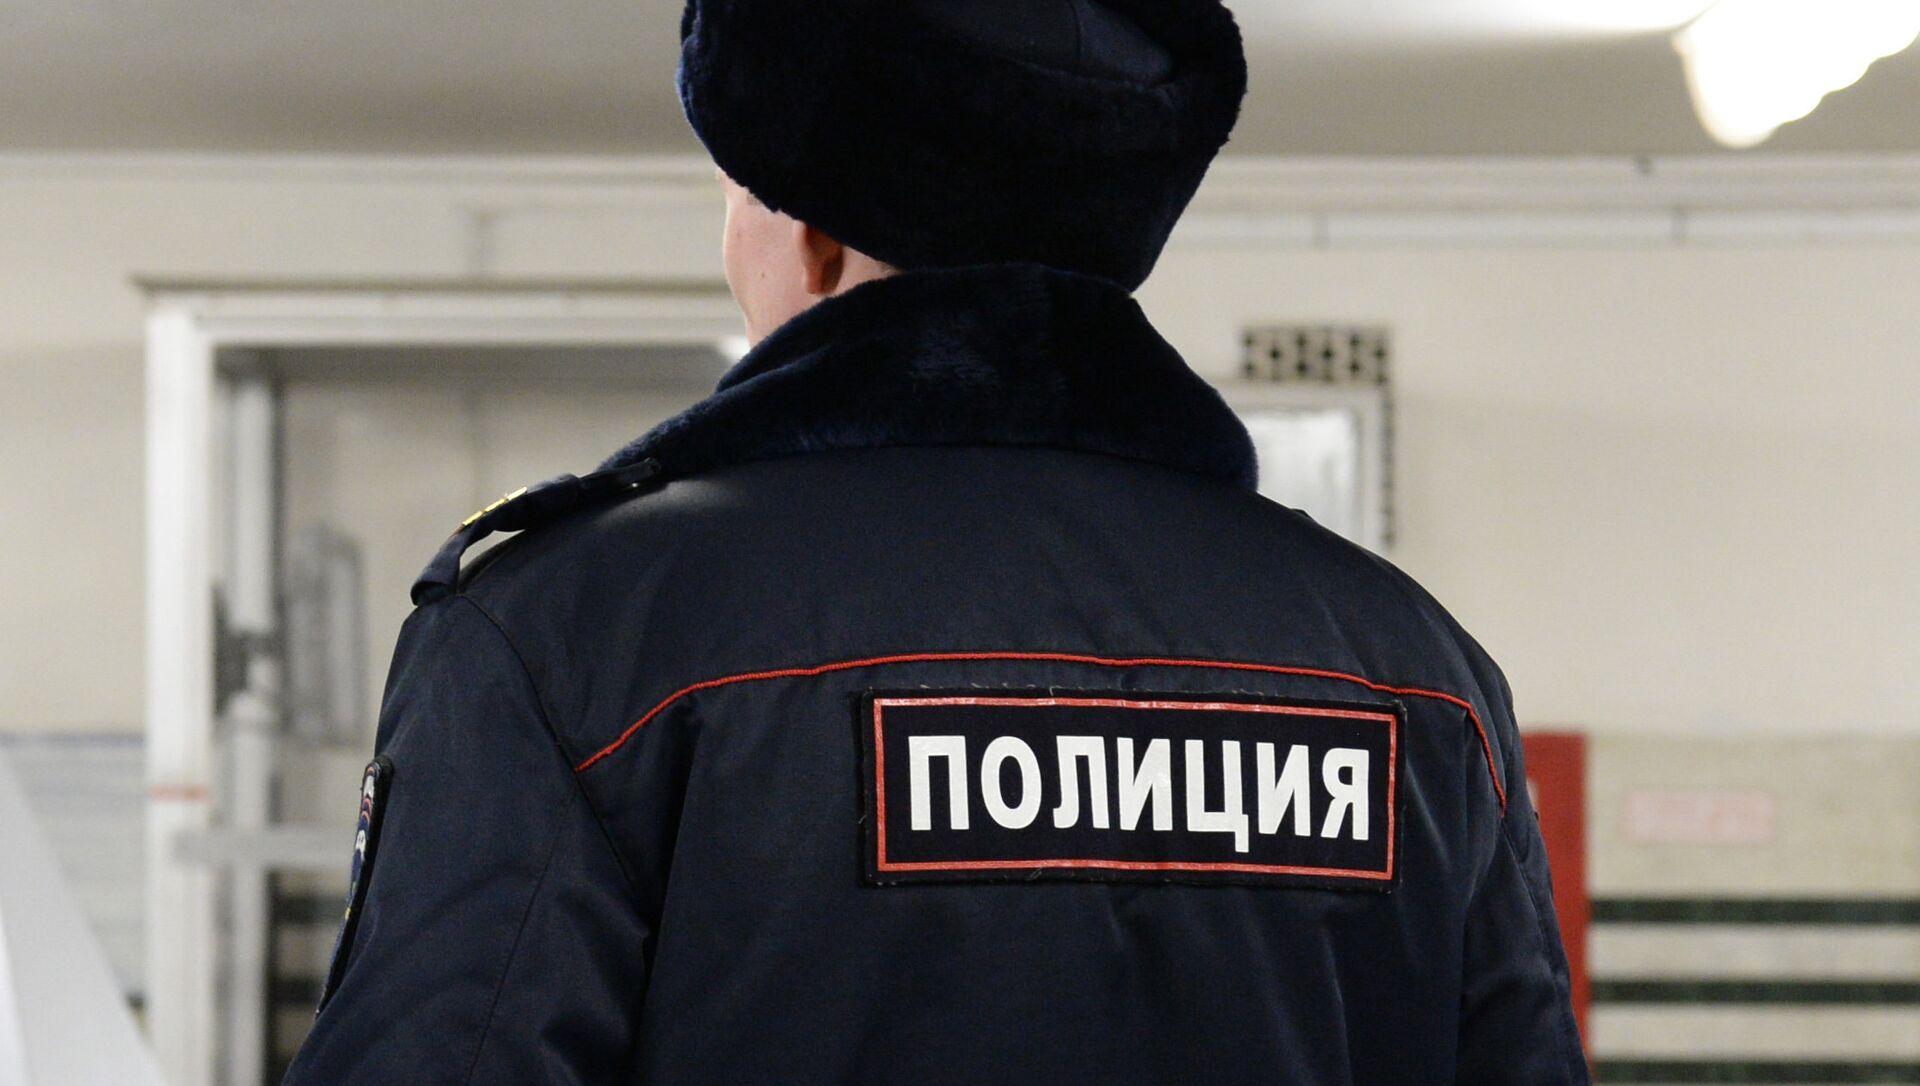 Полиция. Россия - Sputnik Արմենիա, 1920, 17.05.2021